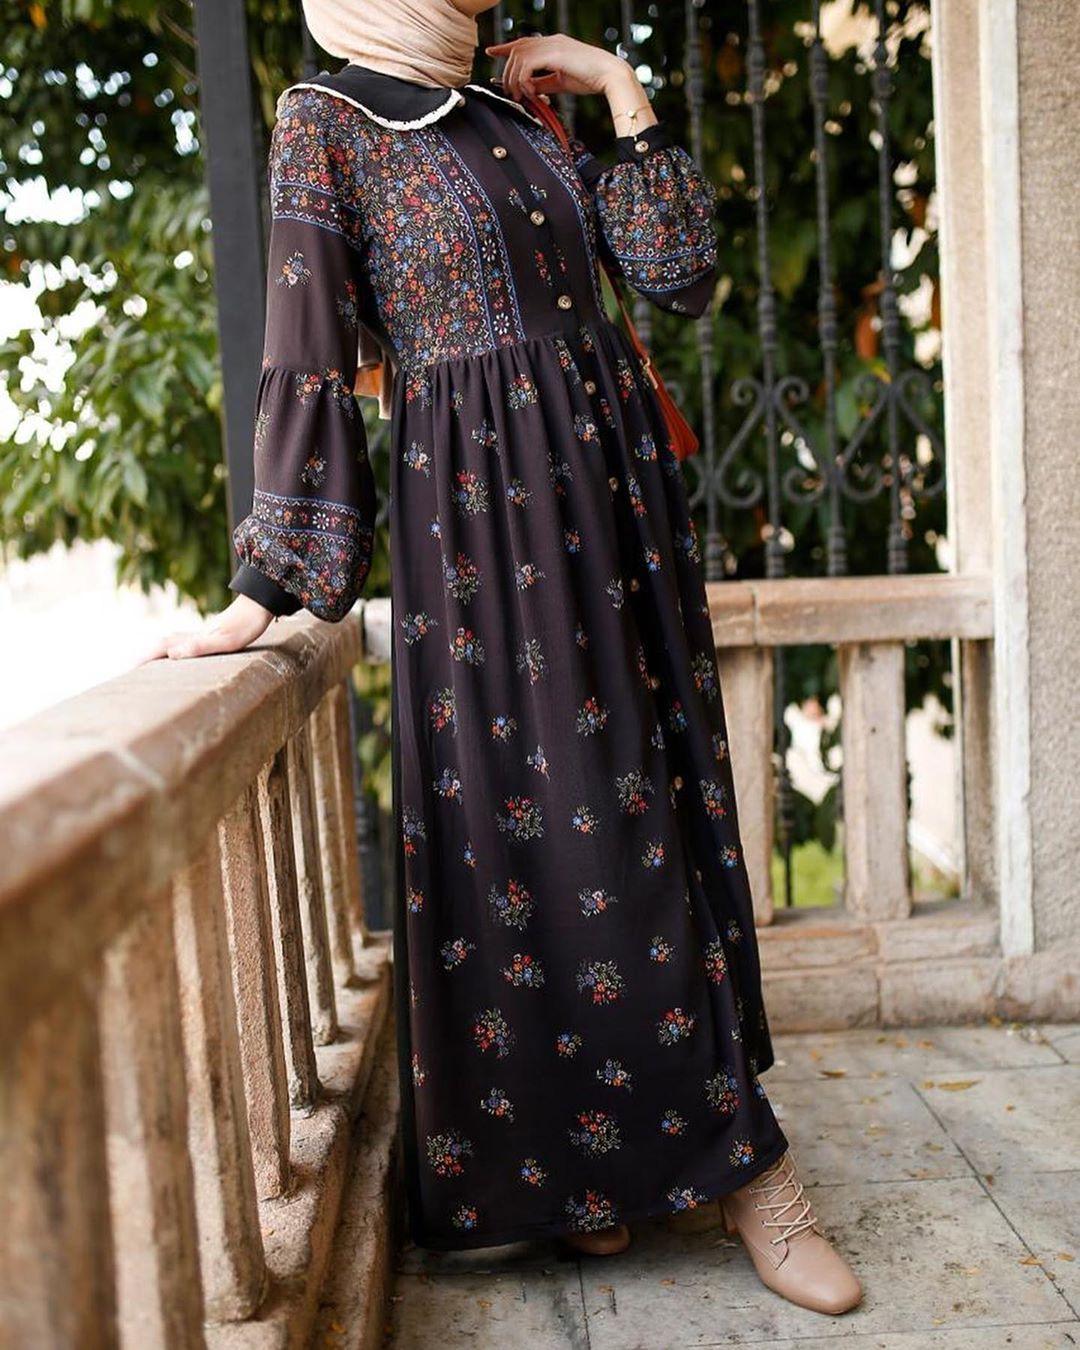 T I O L L O On Instagram Dress Tiollo Tiollohouse Modestfashion Modestclothing Modesty Blogger Mod Dresses Maxi Dress Long Sleeve Dress